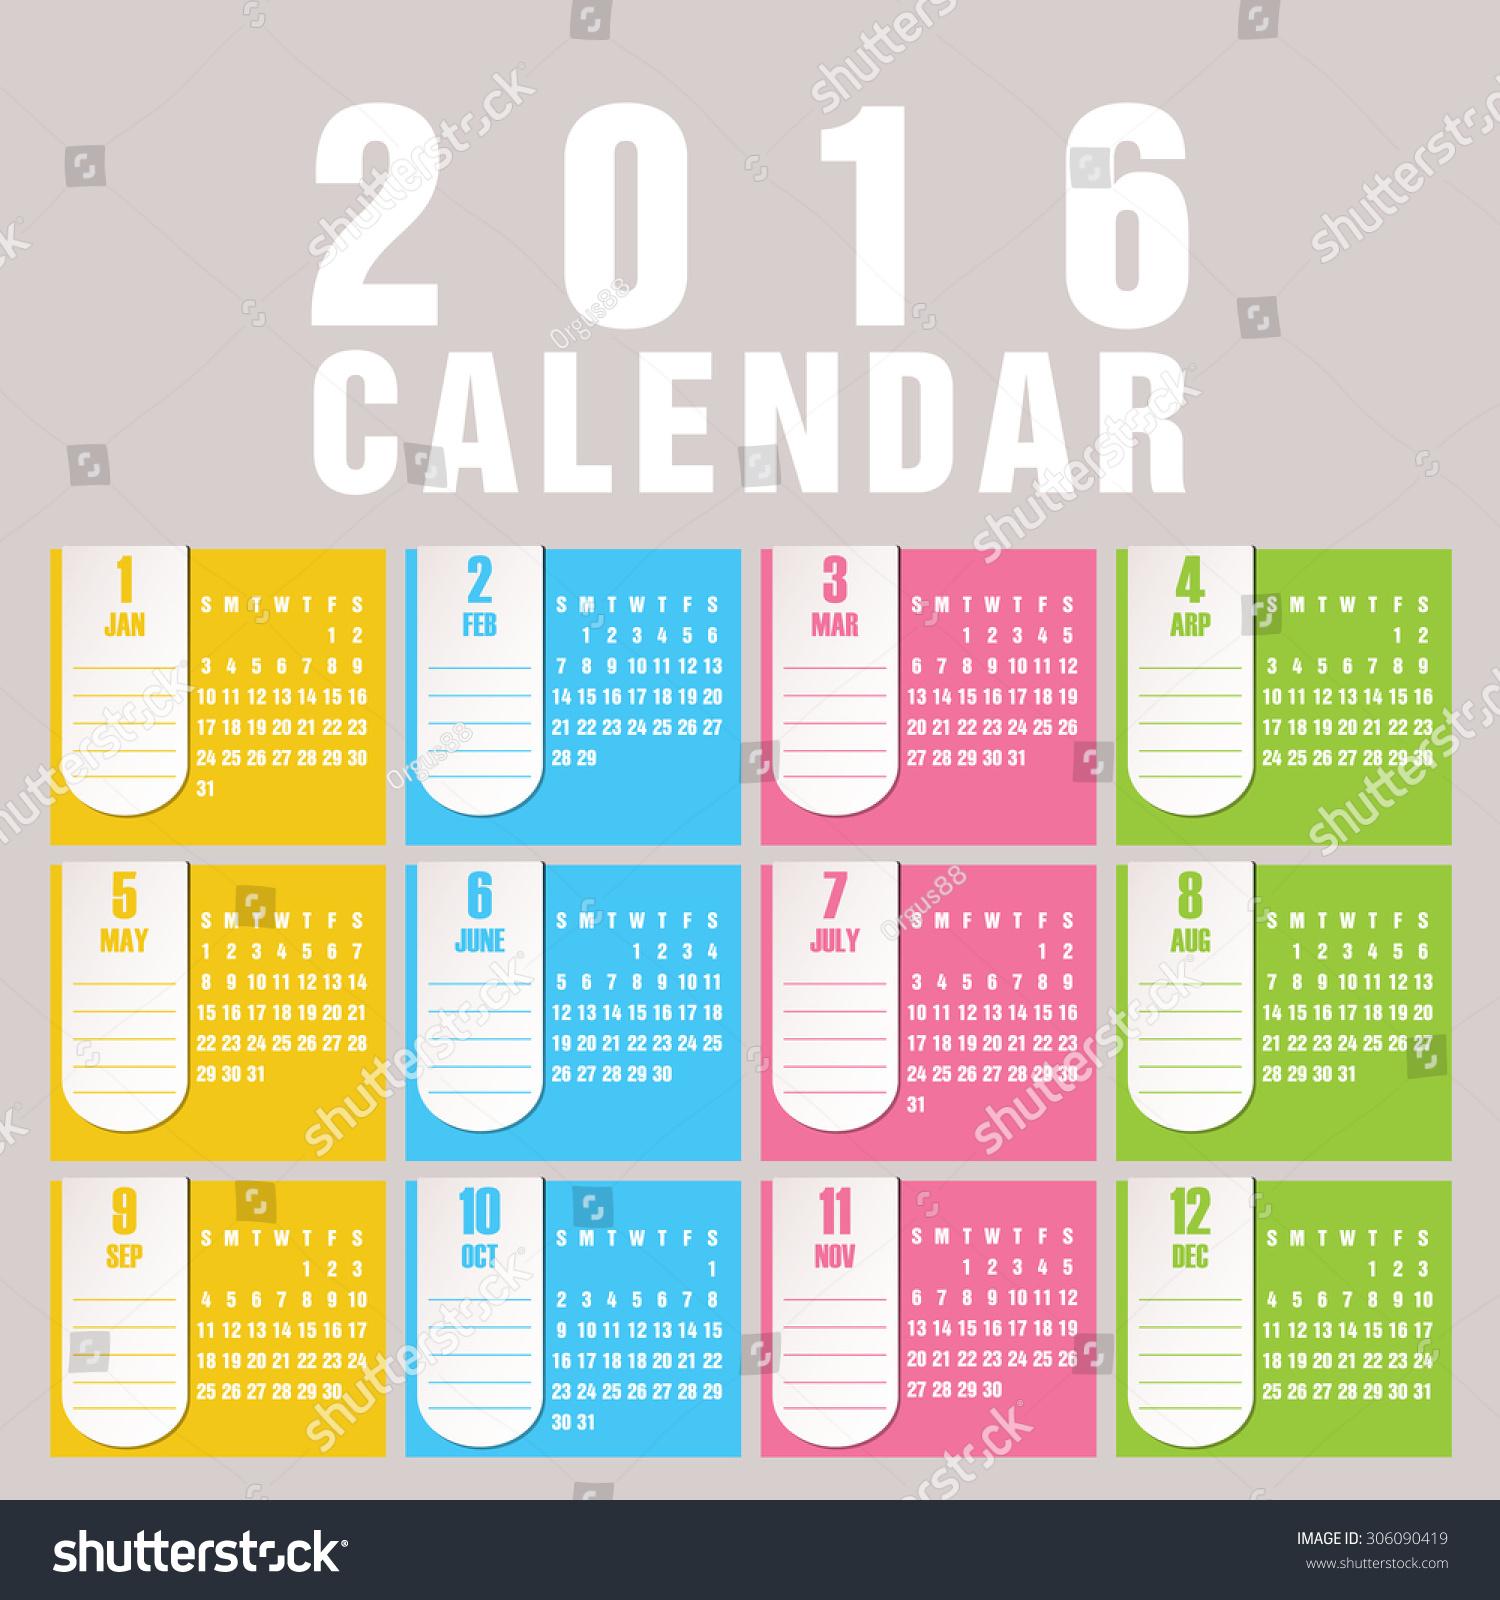 Minimalist Calendar Design : Simple calendar design stock vector